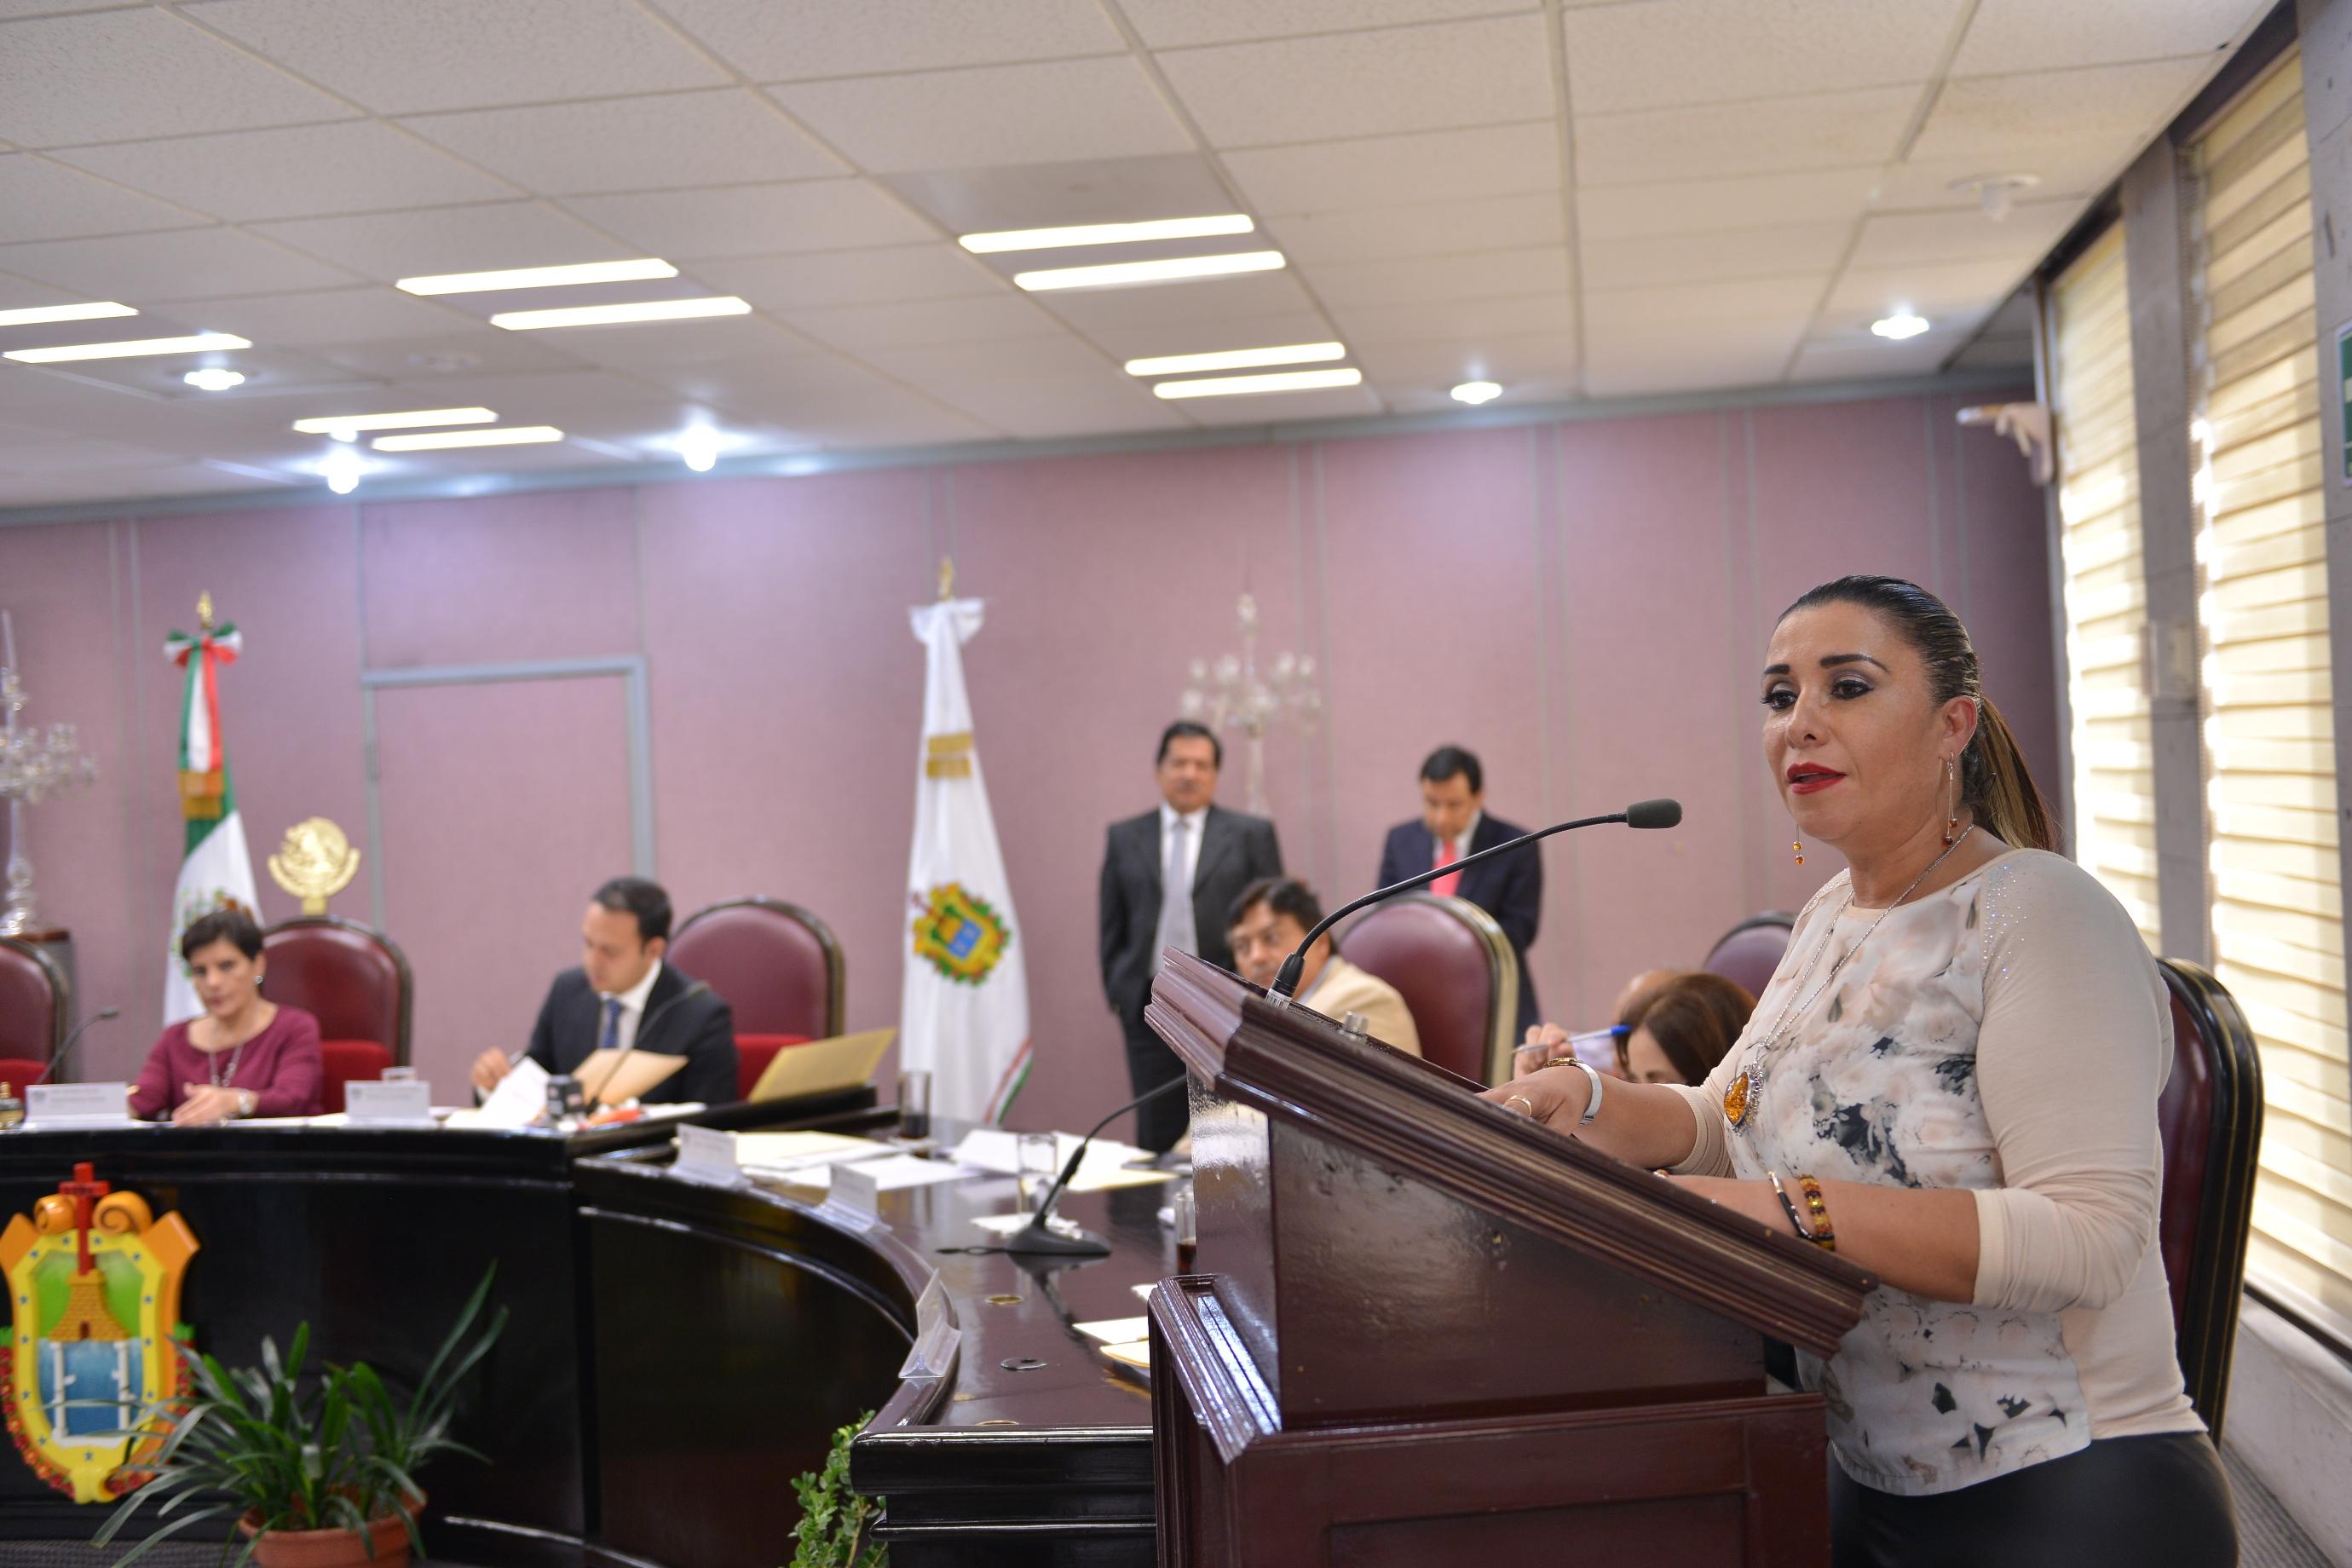 Plantea María Josefina Gamboa la Comisión Veracruzana para la Atención a Periodistas